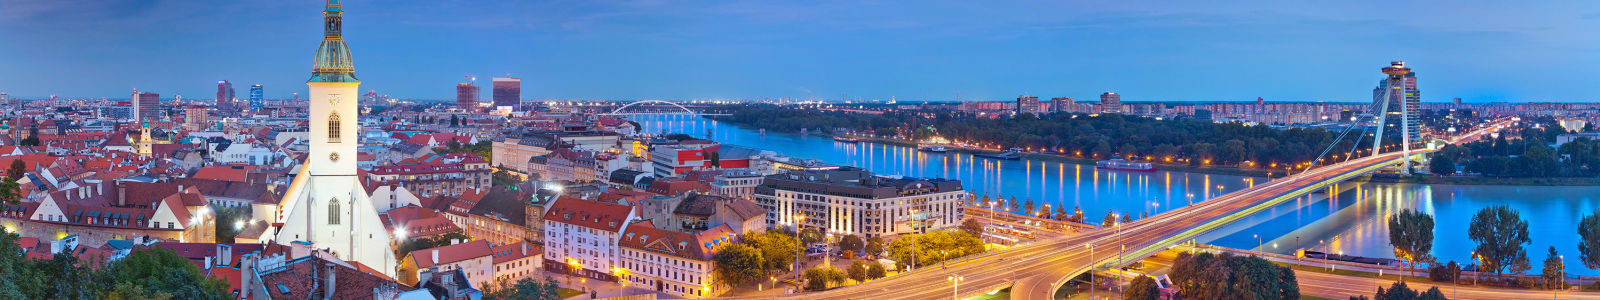 Waterside Bratislava